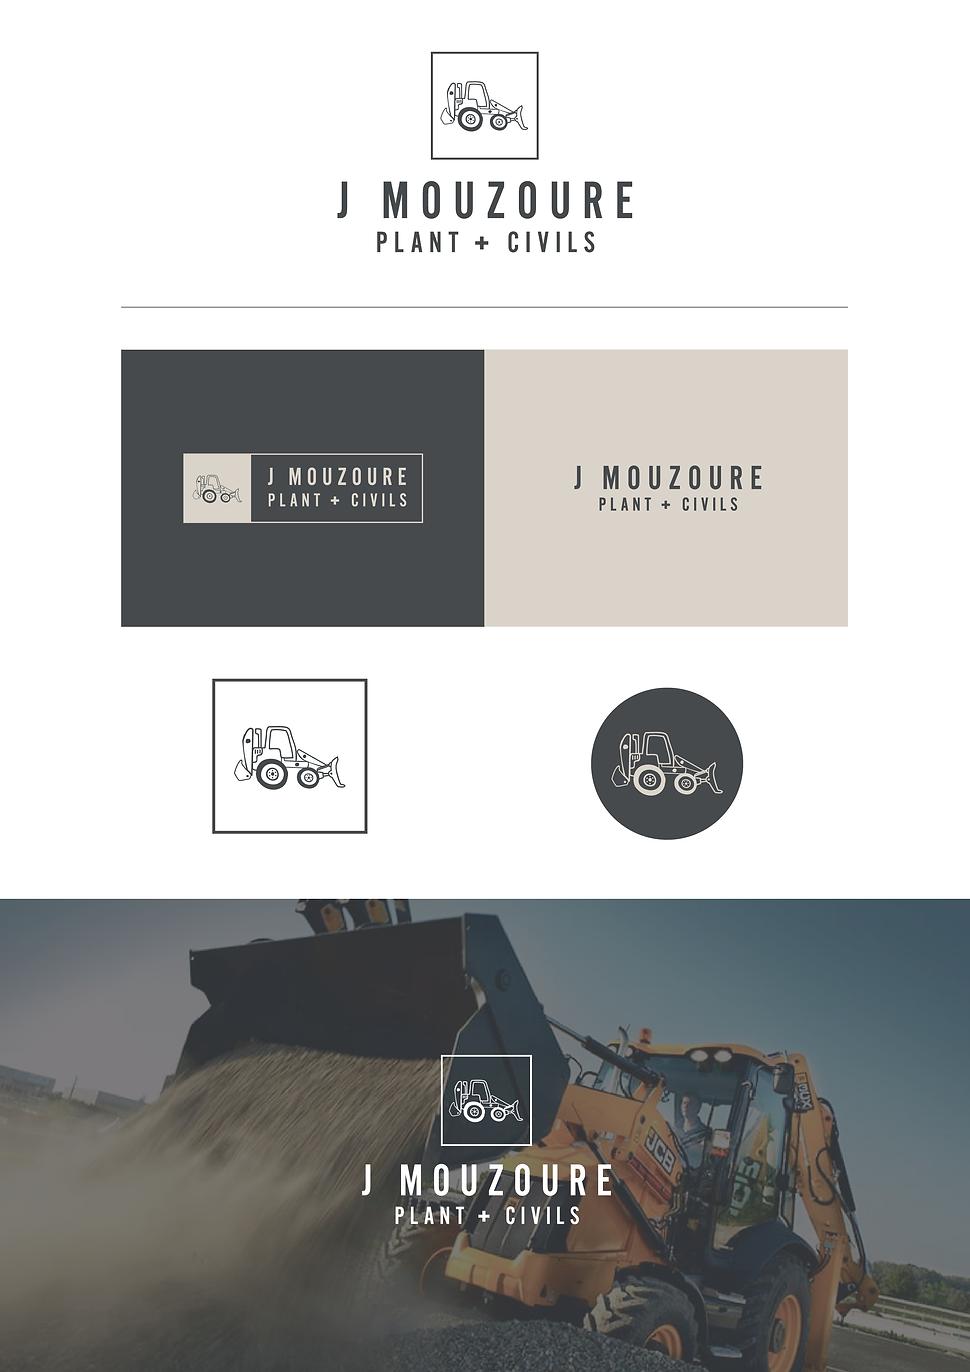 J Mouzoure Plant + Civils - Brand Showca